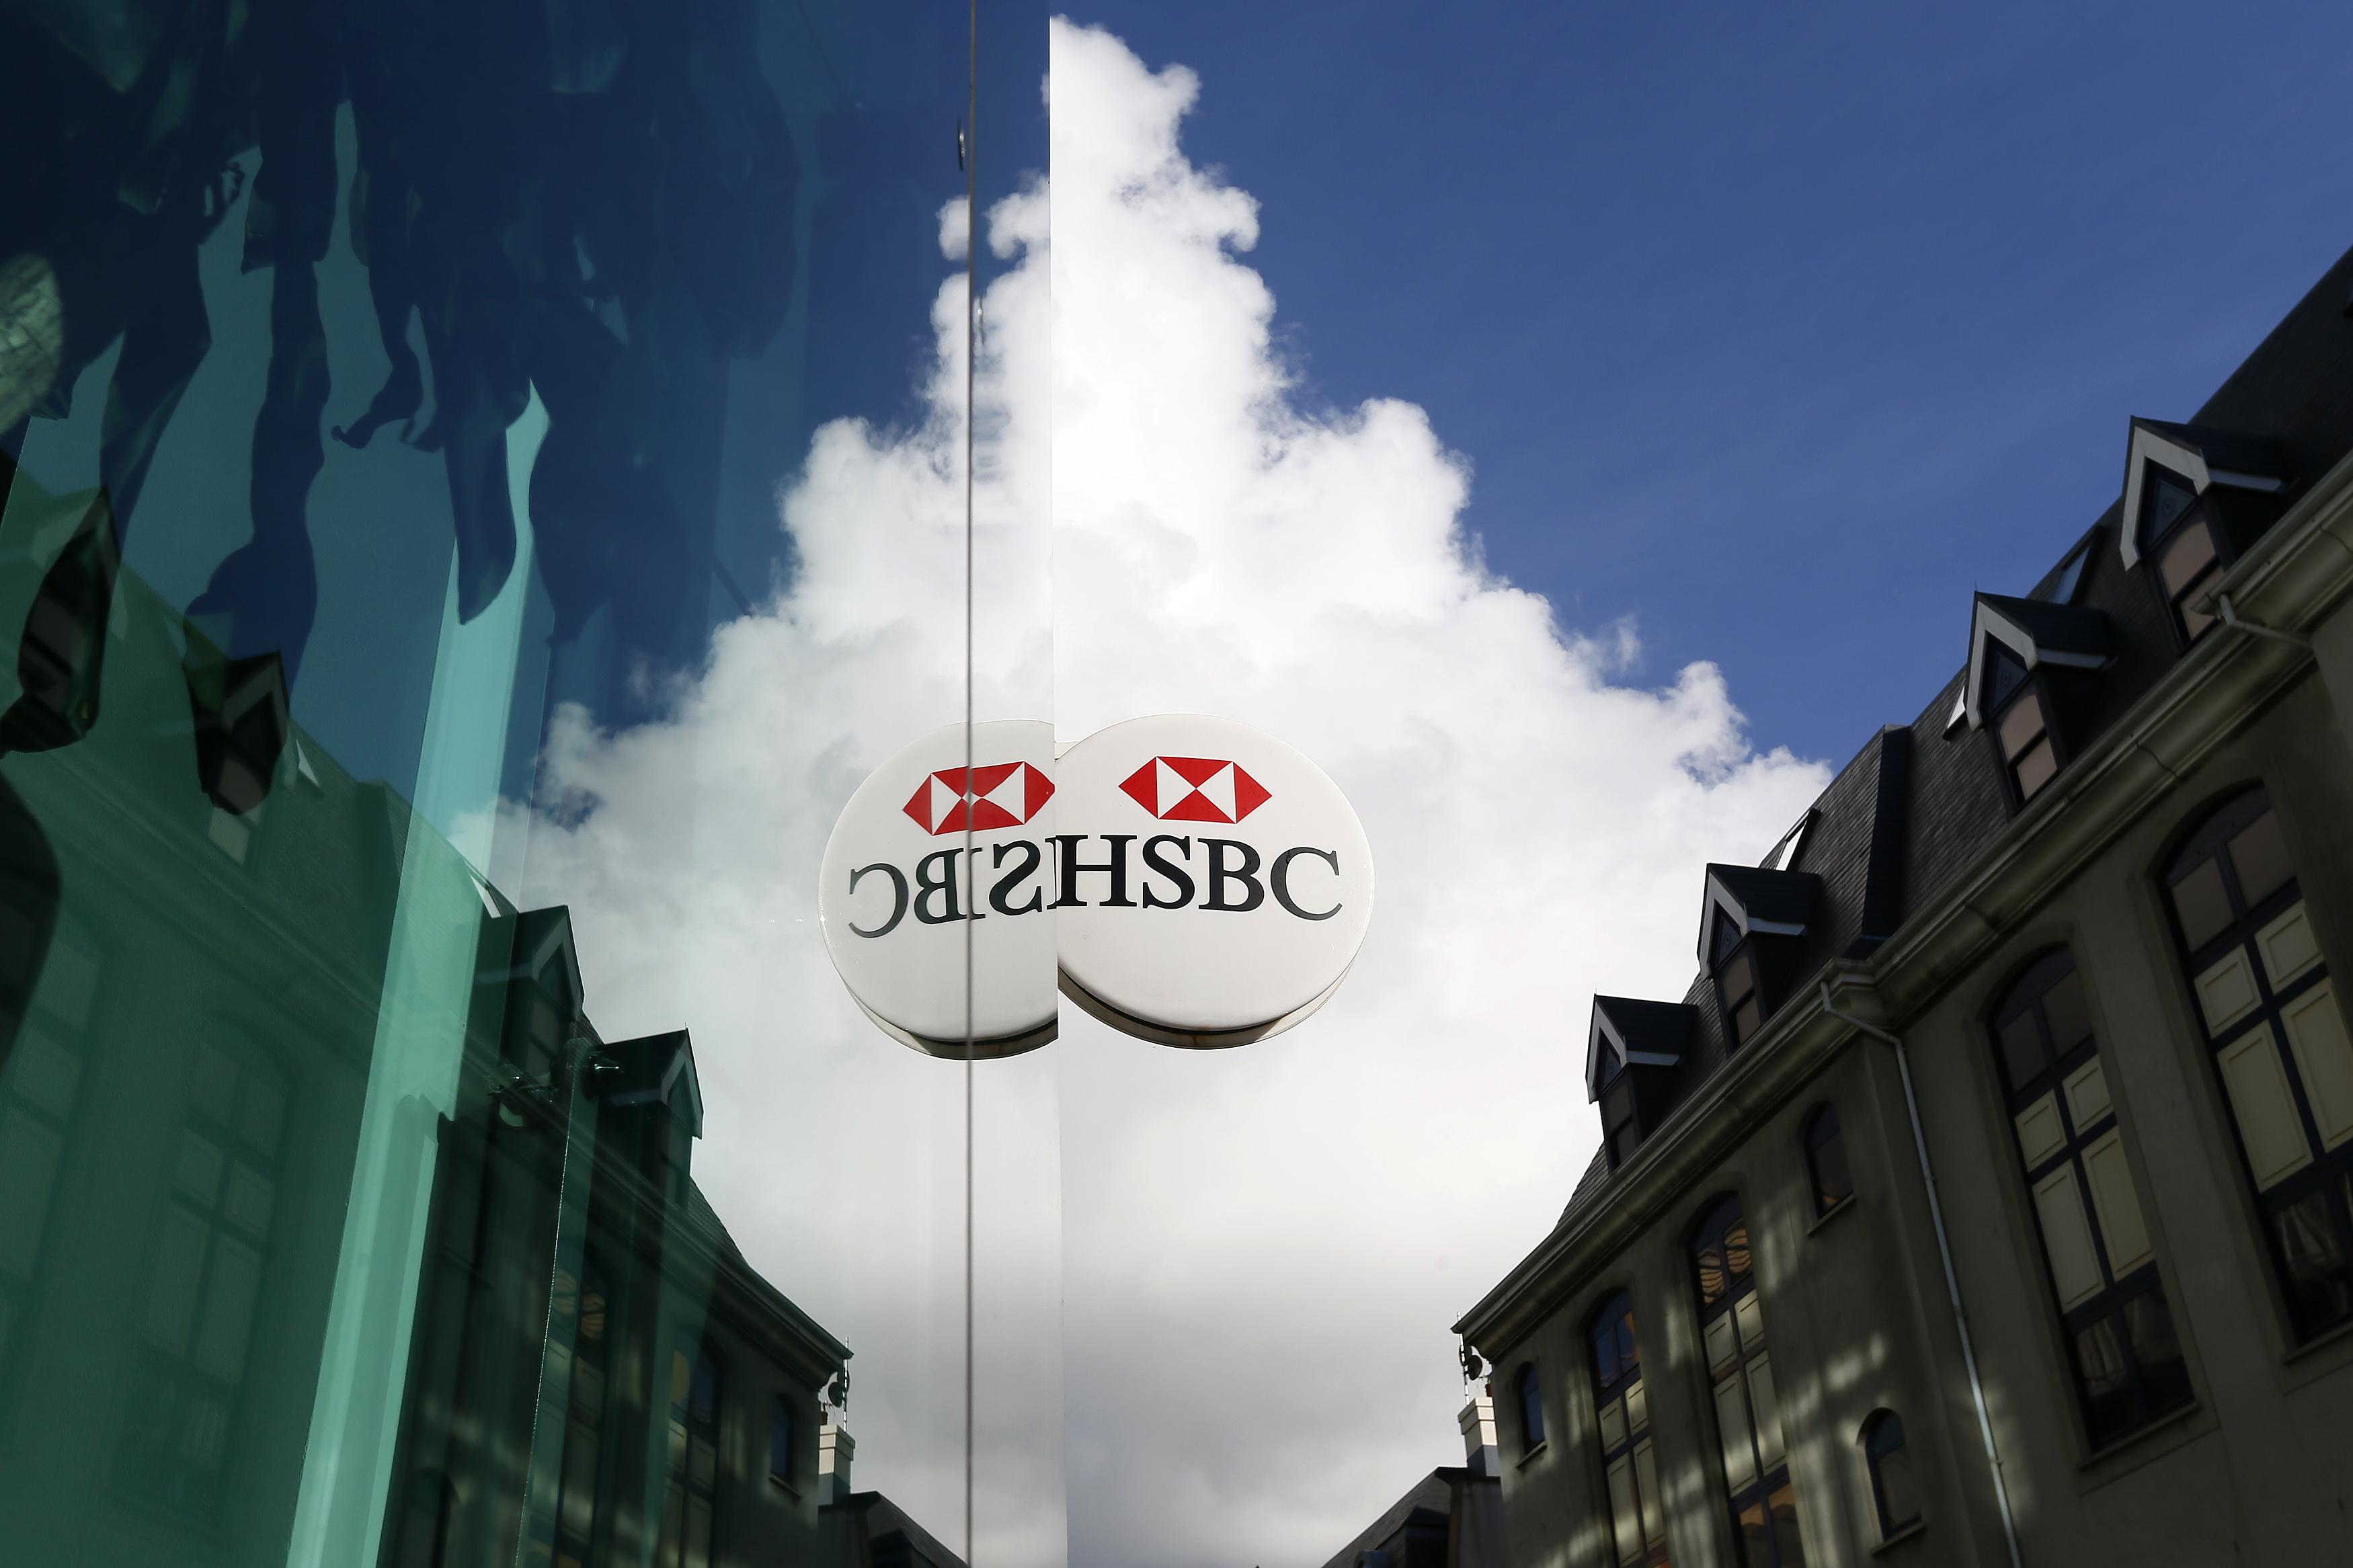 hsbc-jersey-plus-grande-banque-europeenne-paradis-fiscal